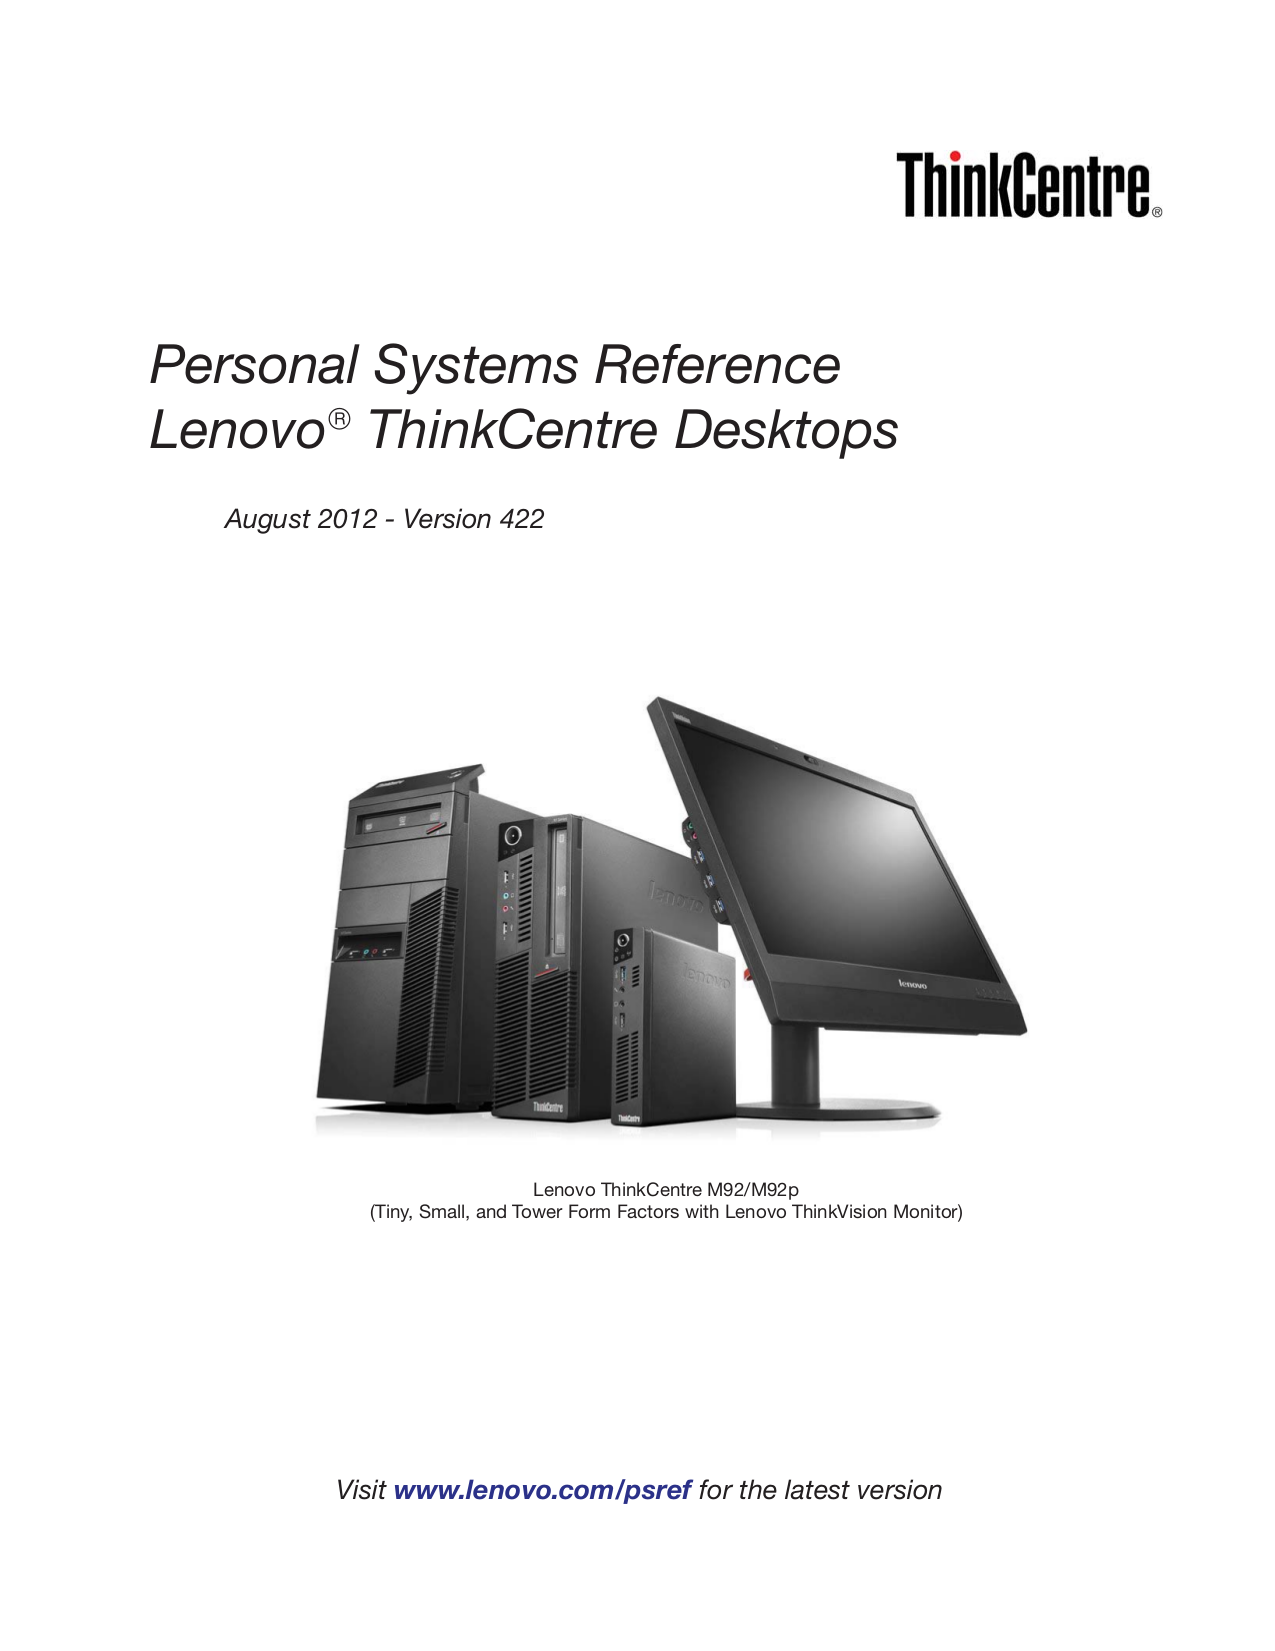 pdf for Lenovo Desktop ThinkCentre M71z 1677 manual